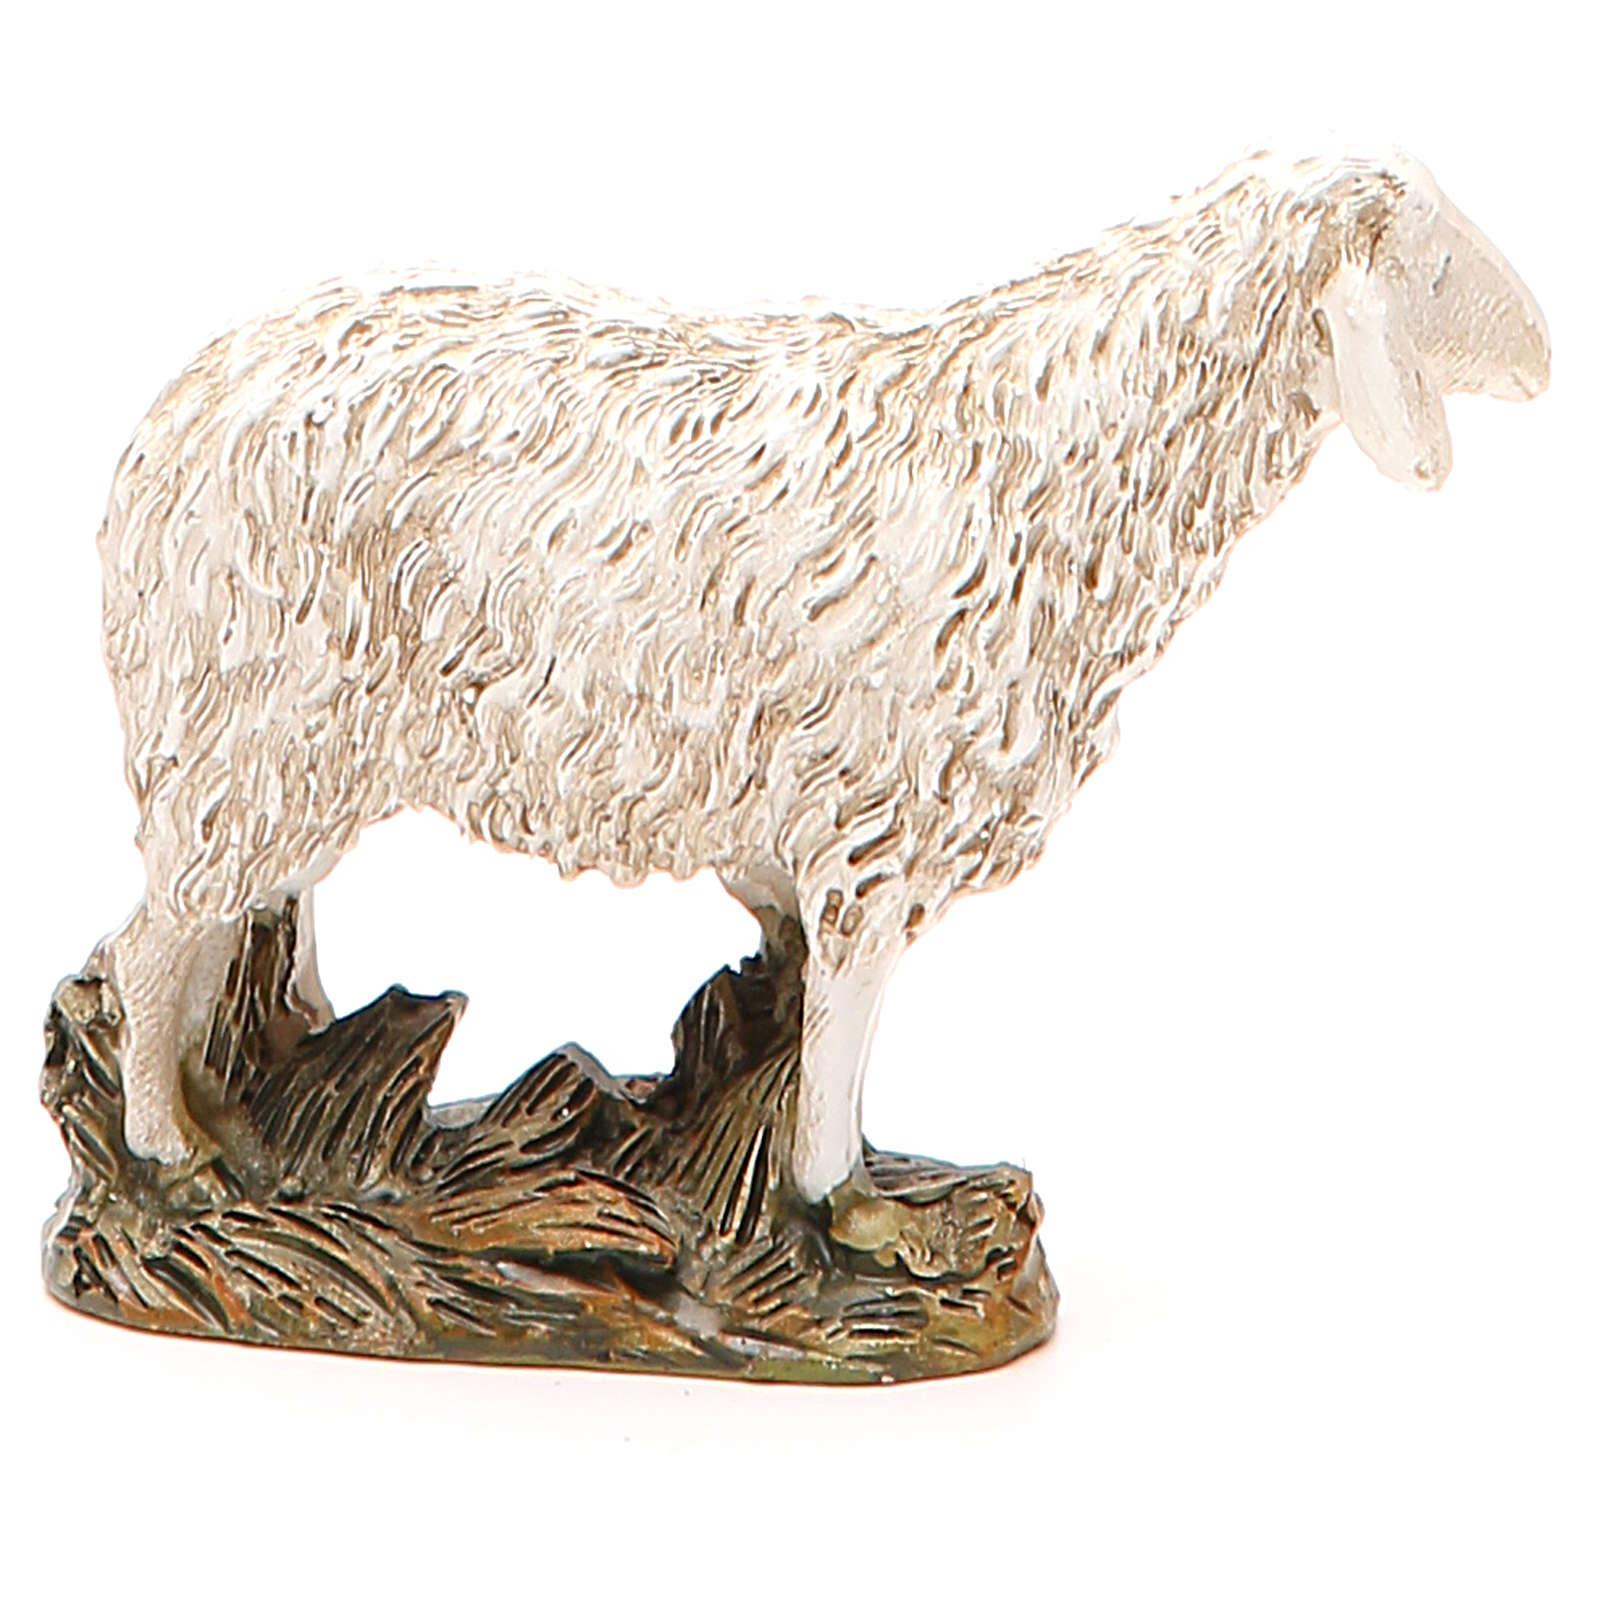 Sheep looking up in painted resin, 12cm Martino Landi Nativity 3